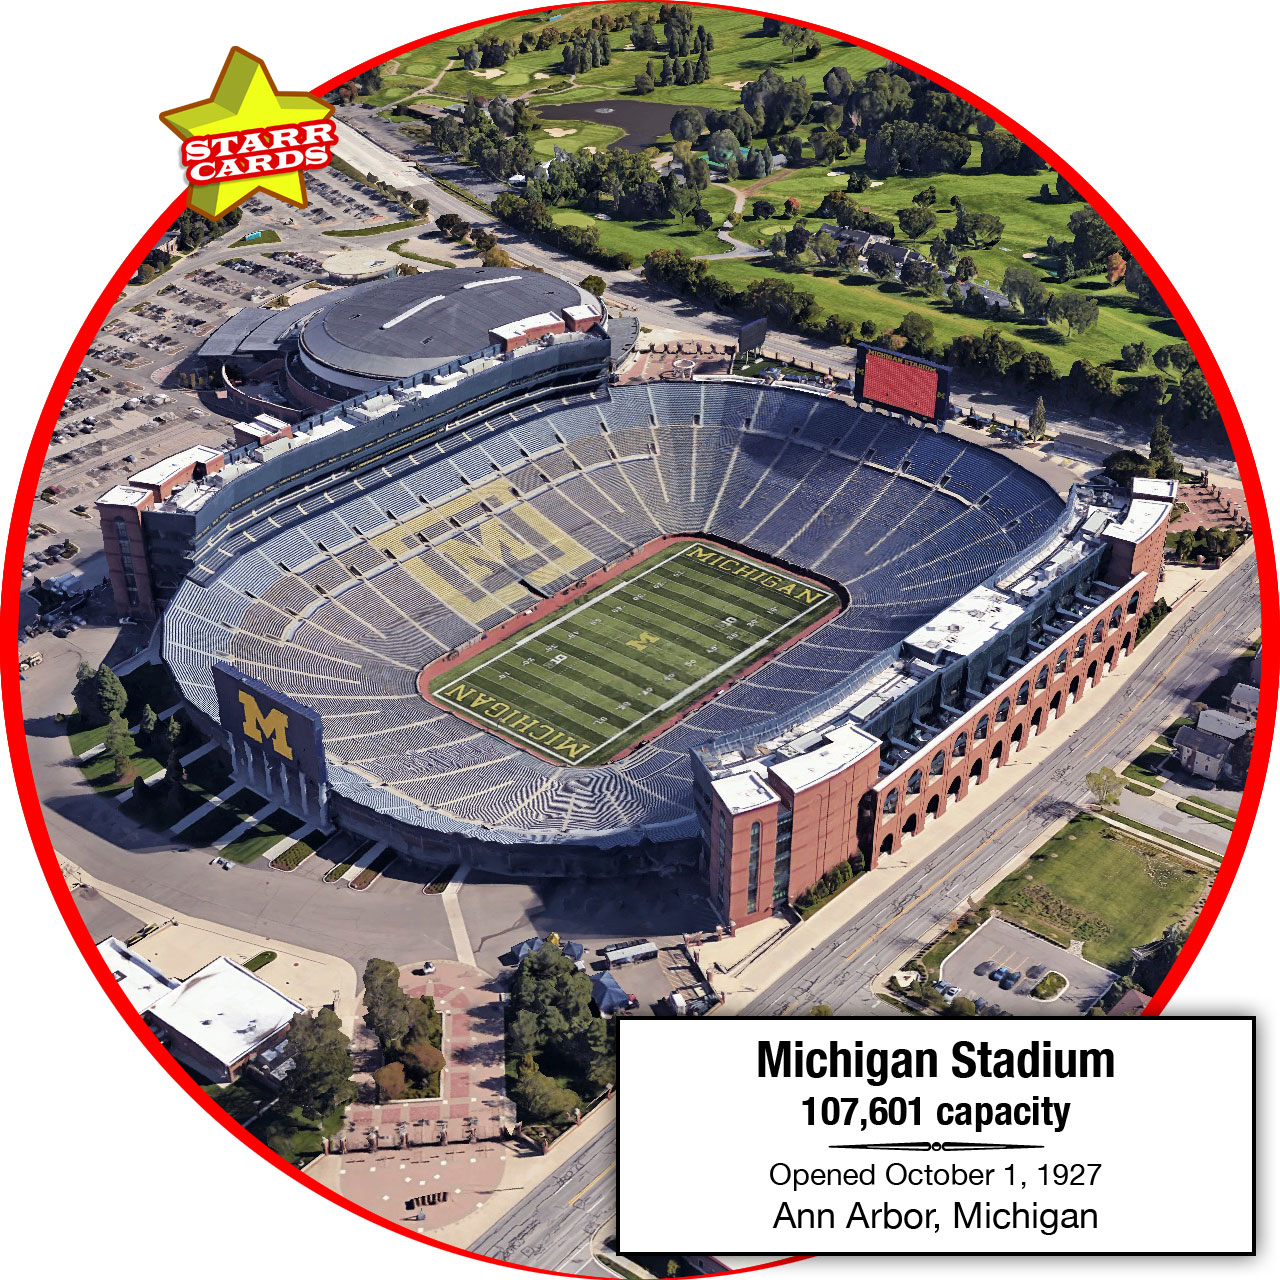 Michigan Stadium, Ann Arbor, Michigan: Home to the Michigan Wolverines